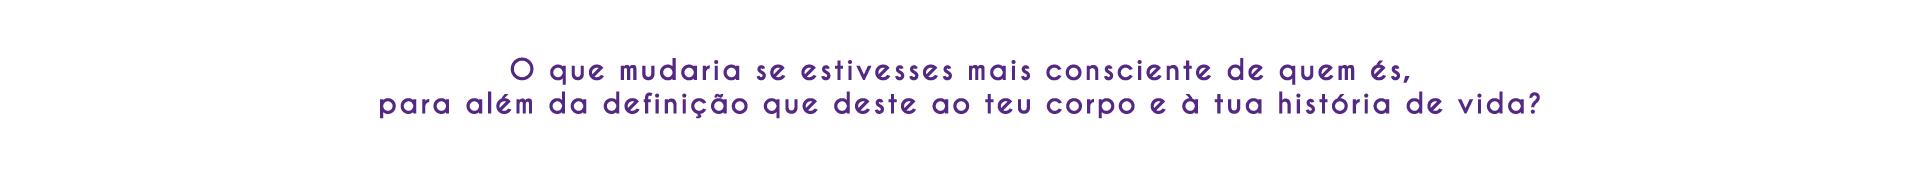 Isabel Ferreira - Frase